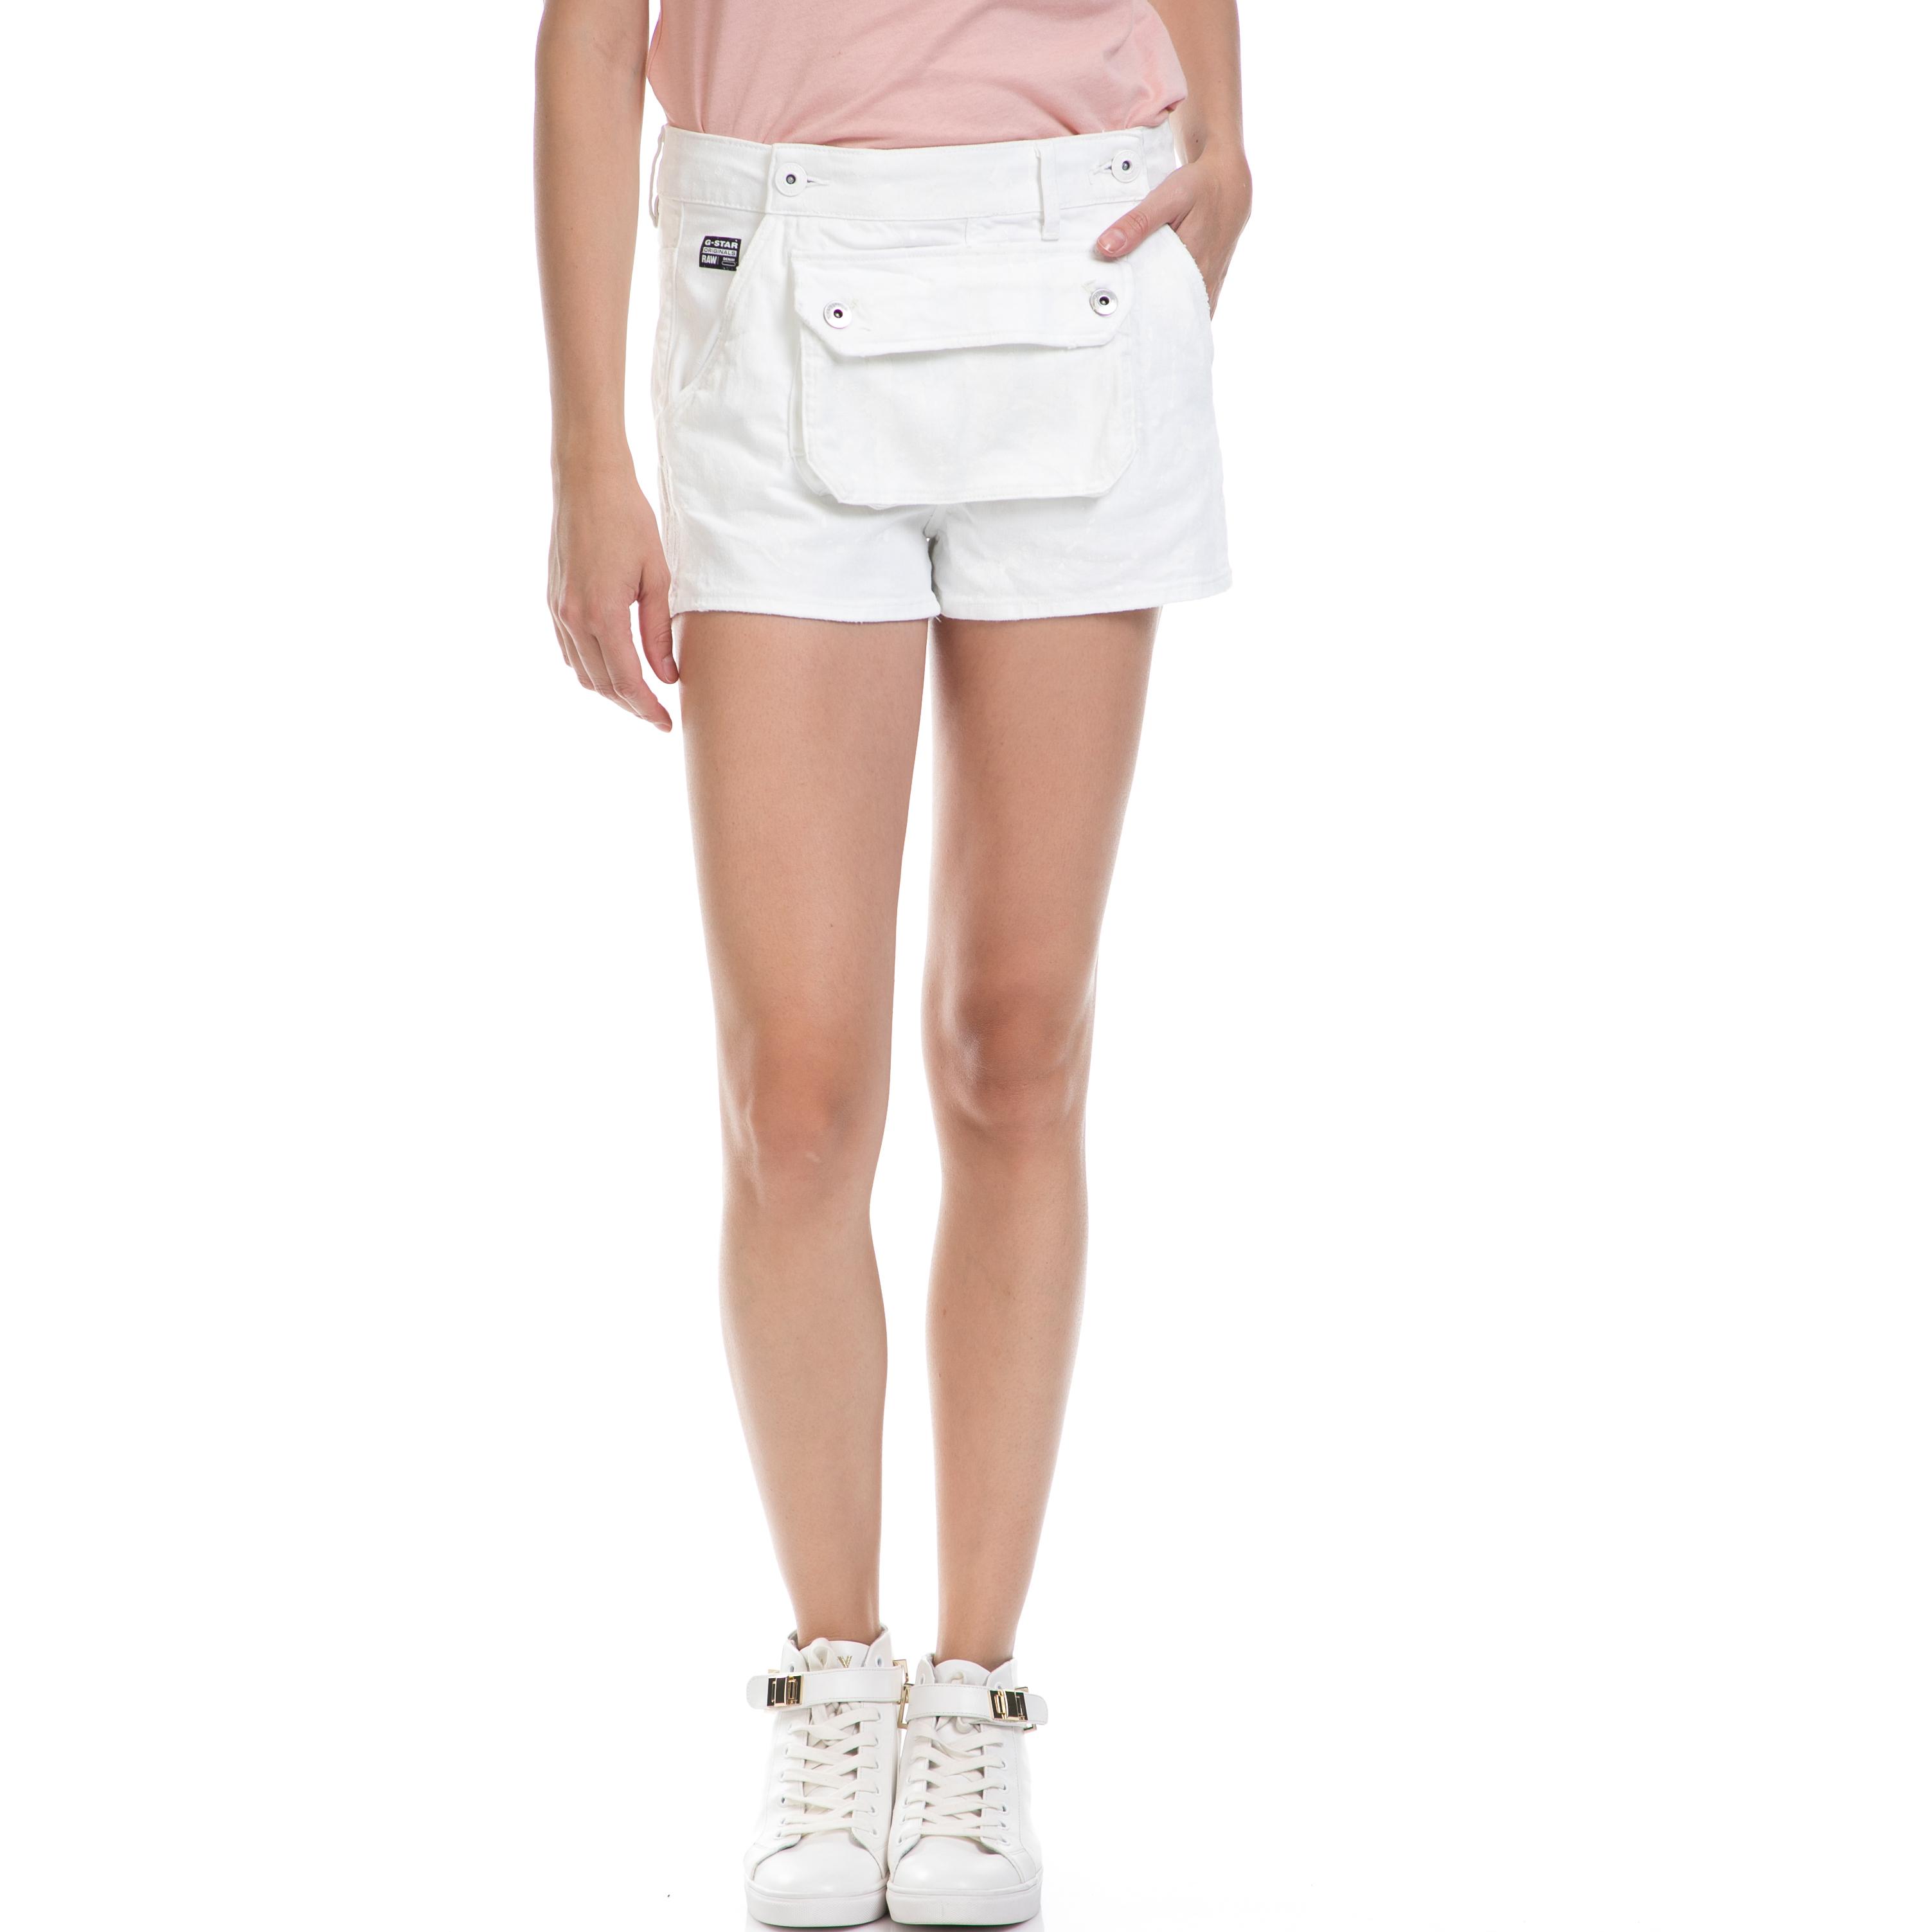 G-STAR - Γυναικείο σορτς G-STAR RAW άσπρο γυναικεία ρούχα σορτς βερμούδες casual jean